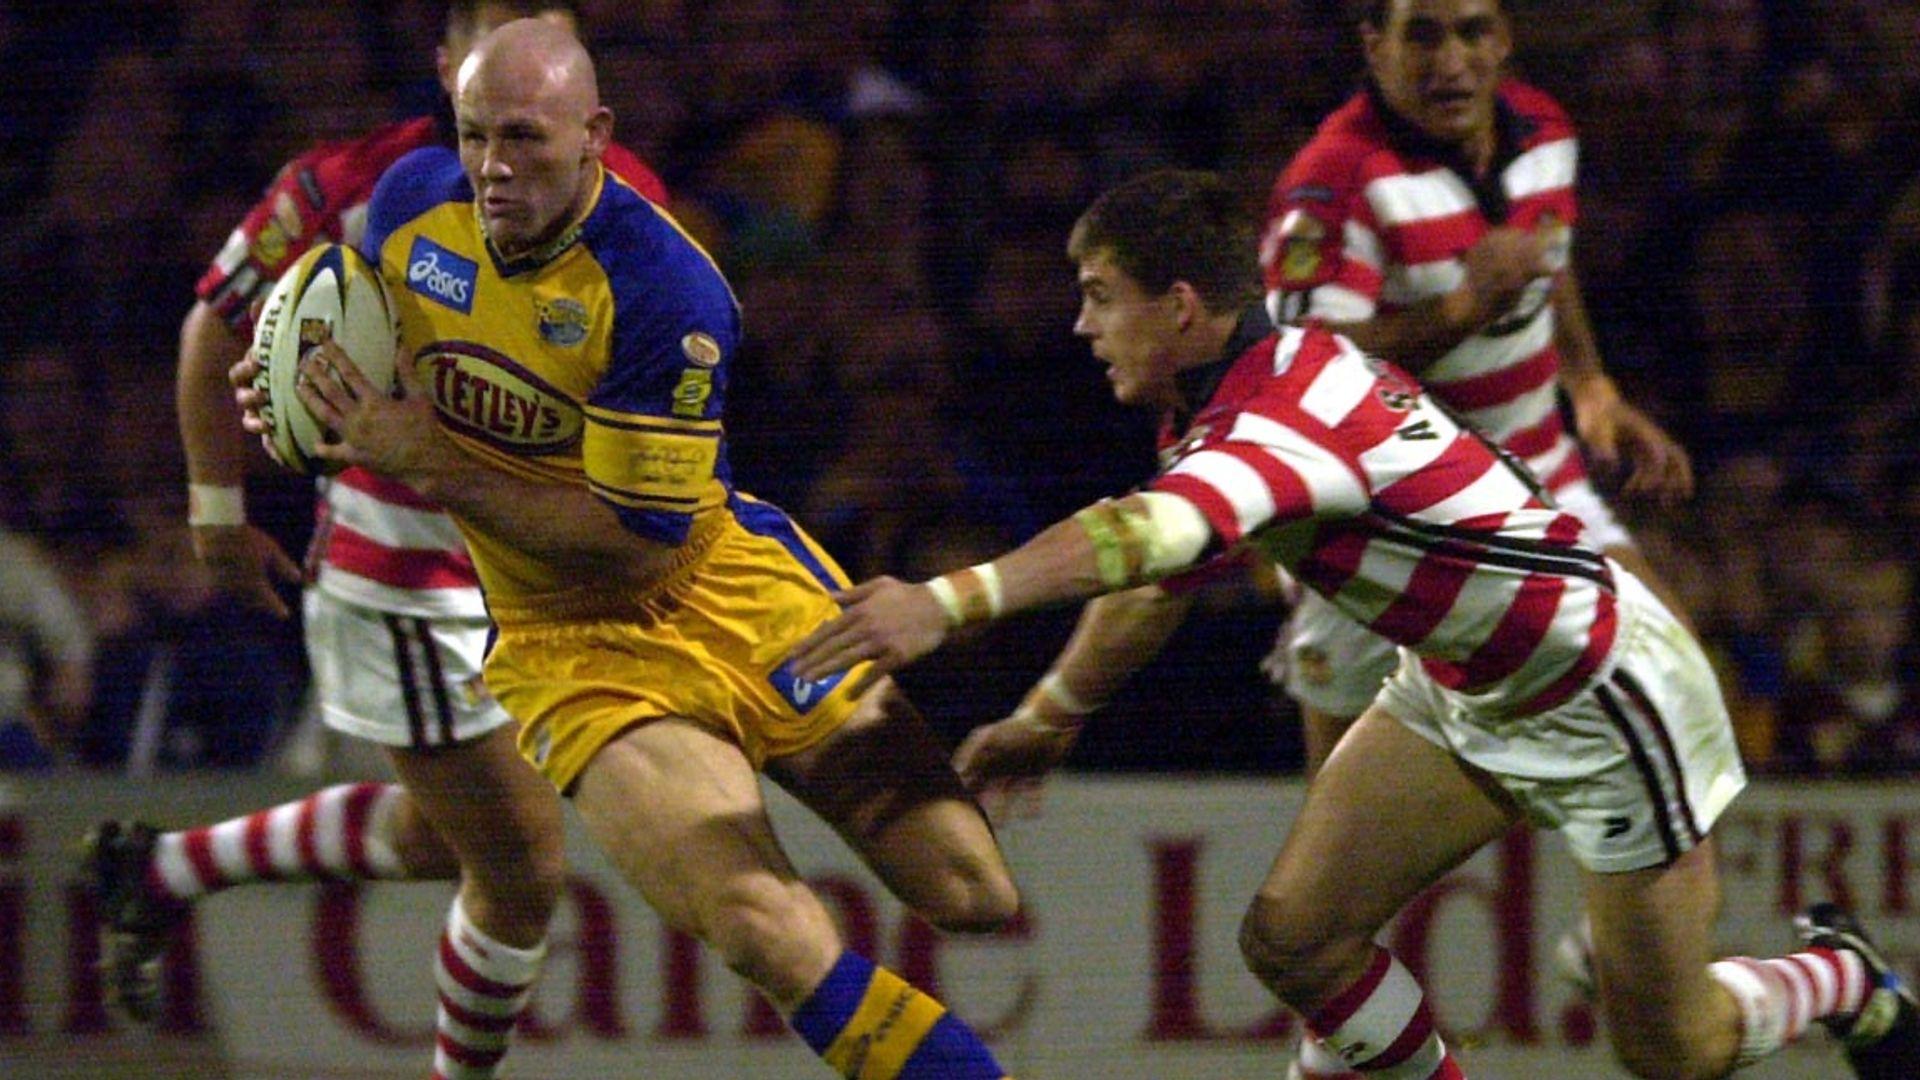 VOTE: Retro Rugby League fans' choice